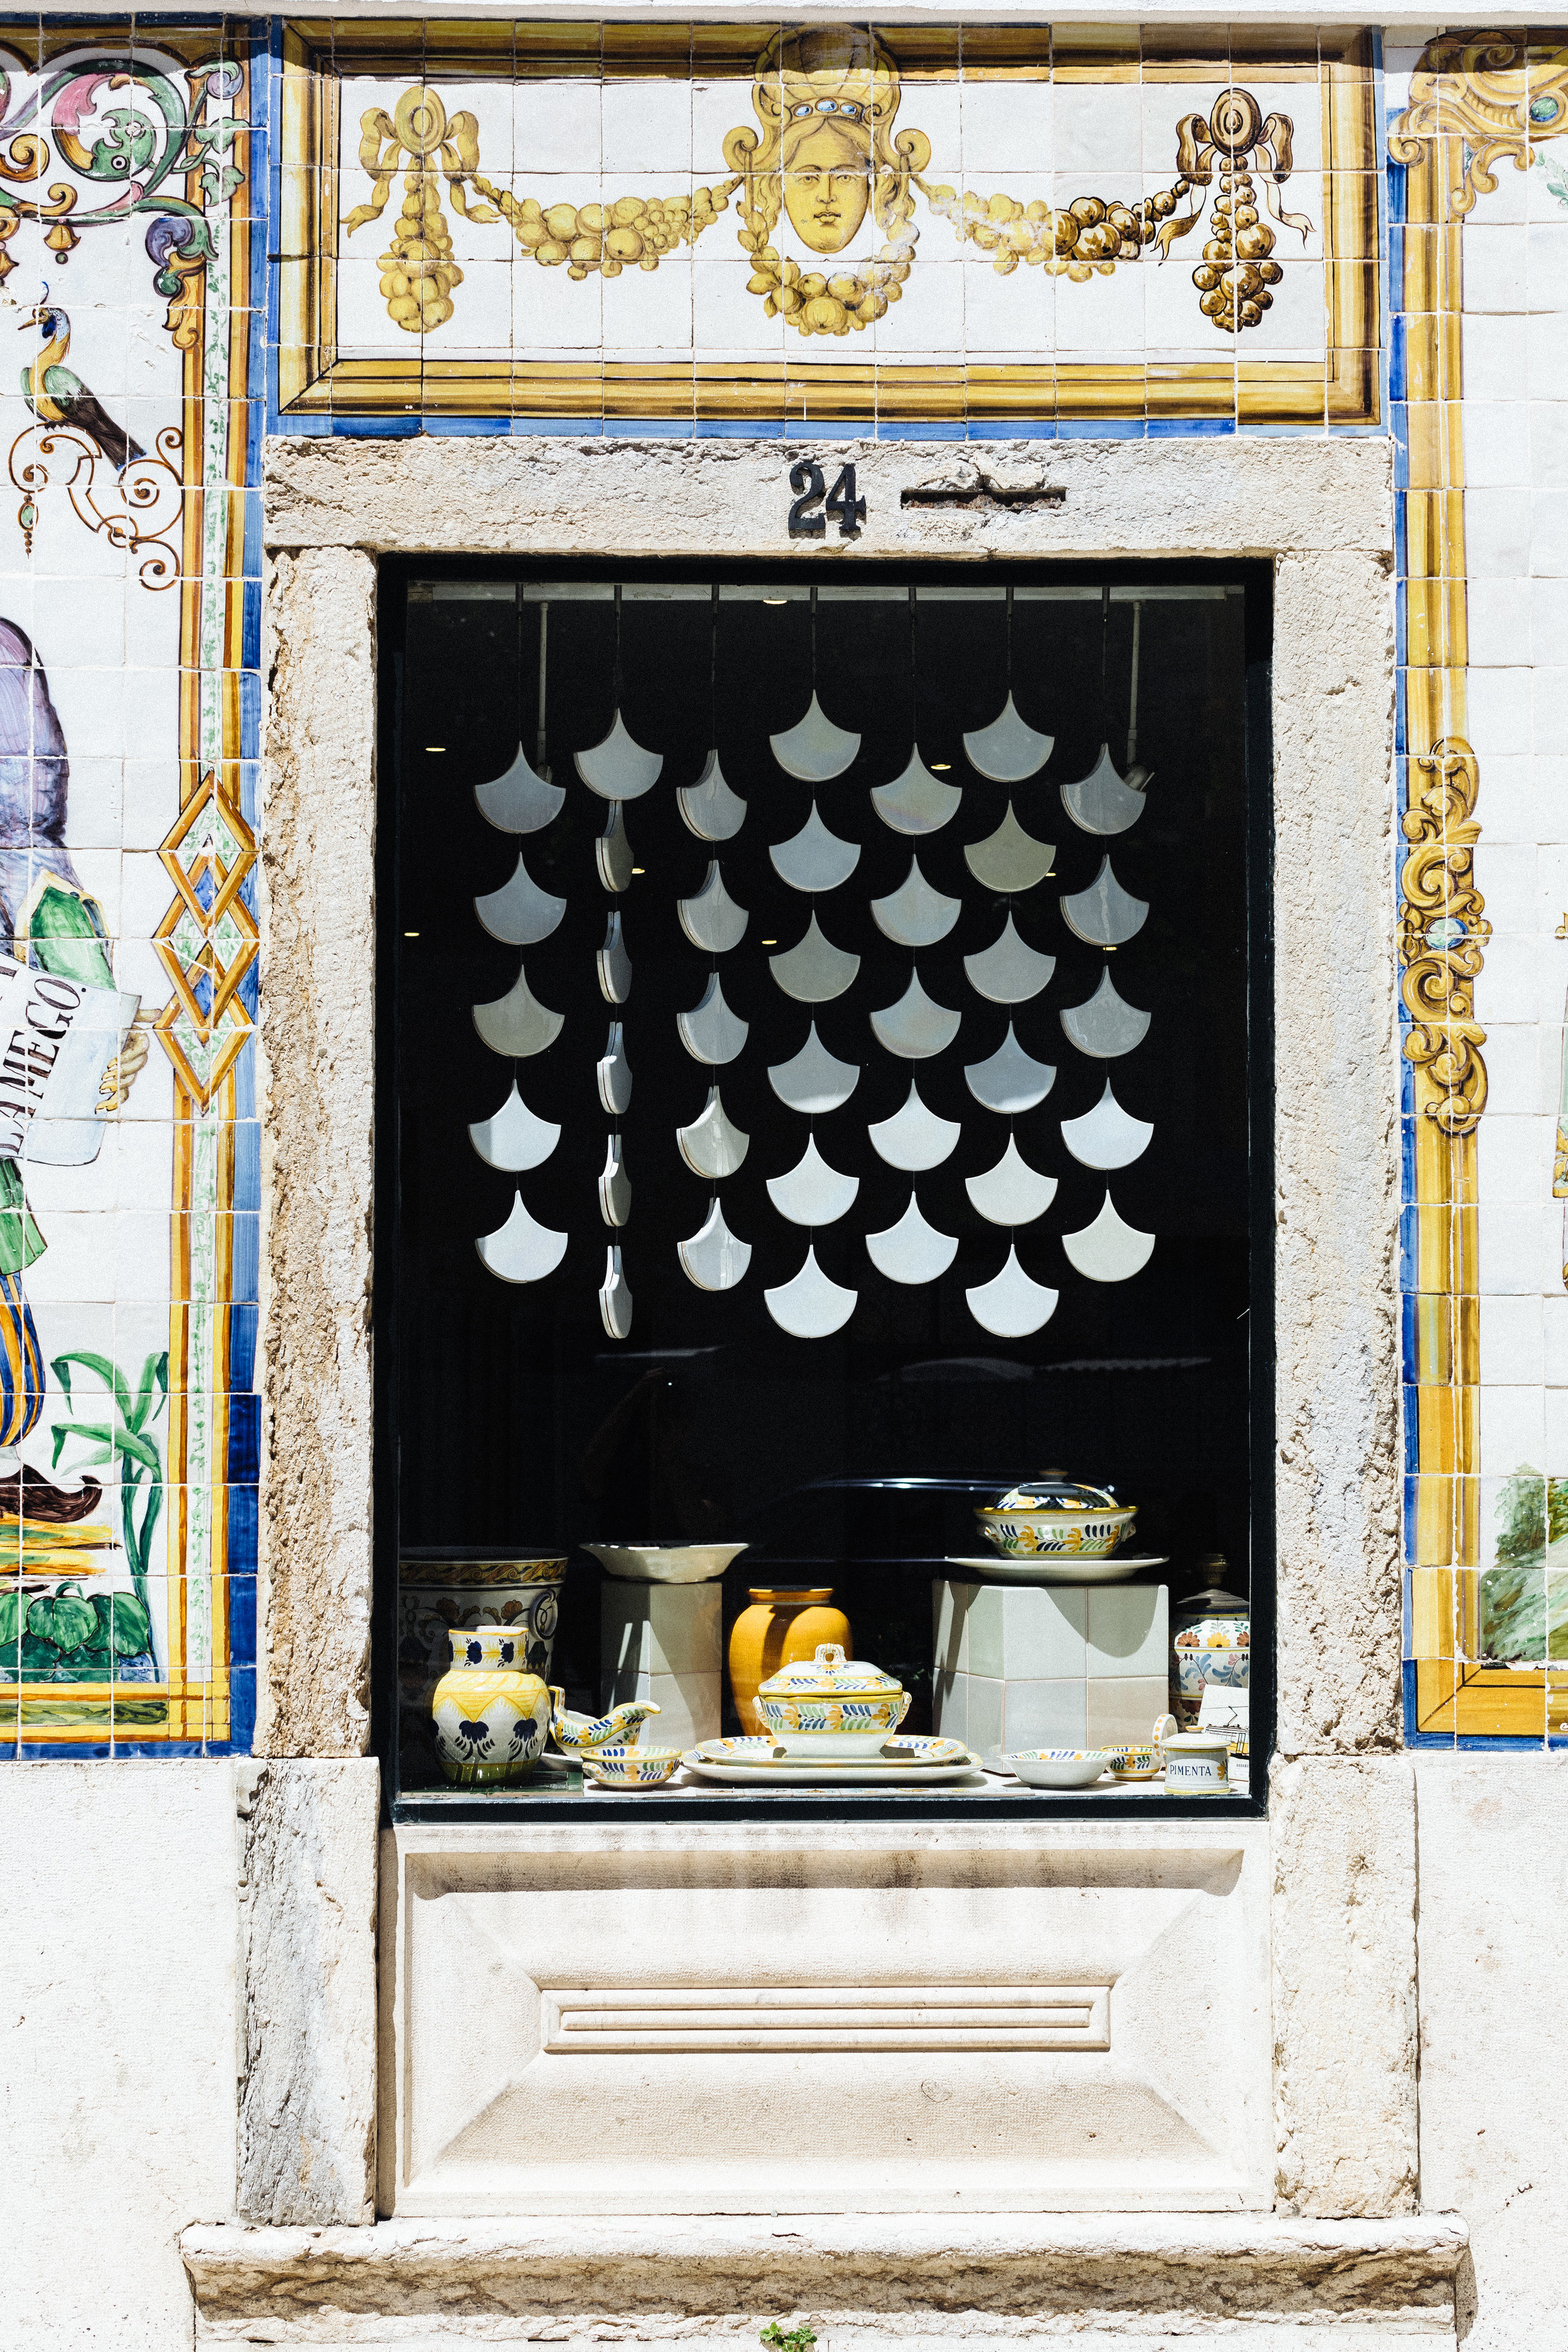 Tile shop.jpg